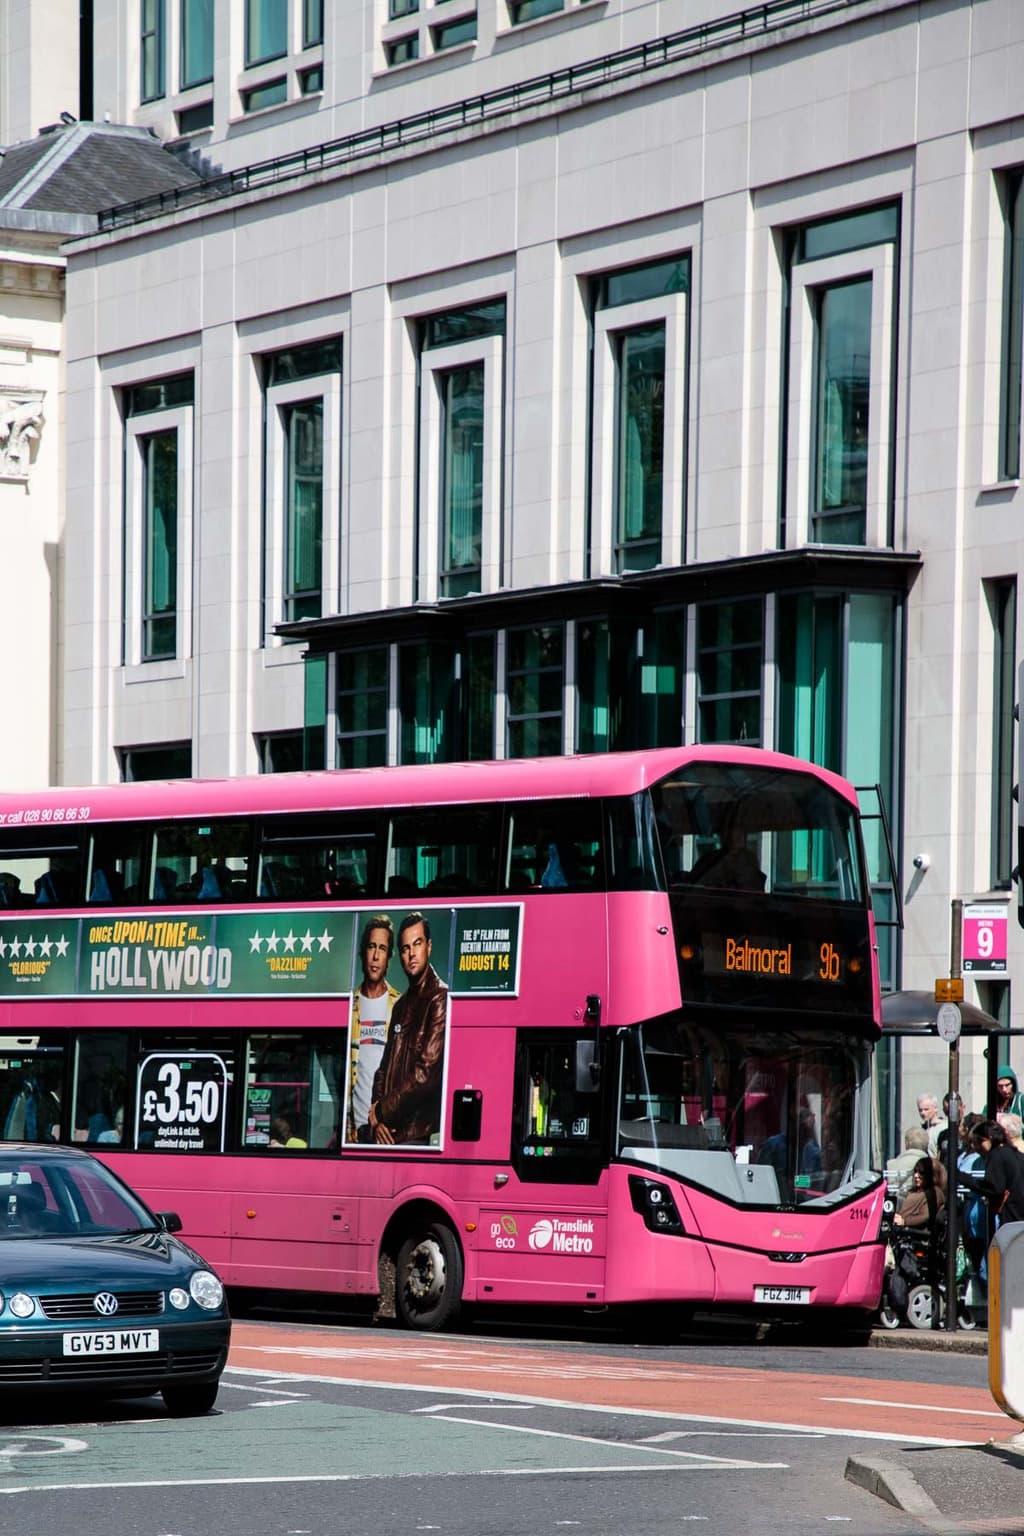 Photo of a Belfast hot pink double decker bus.